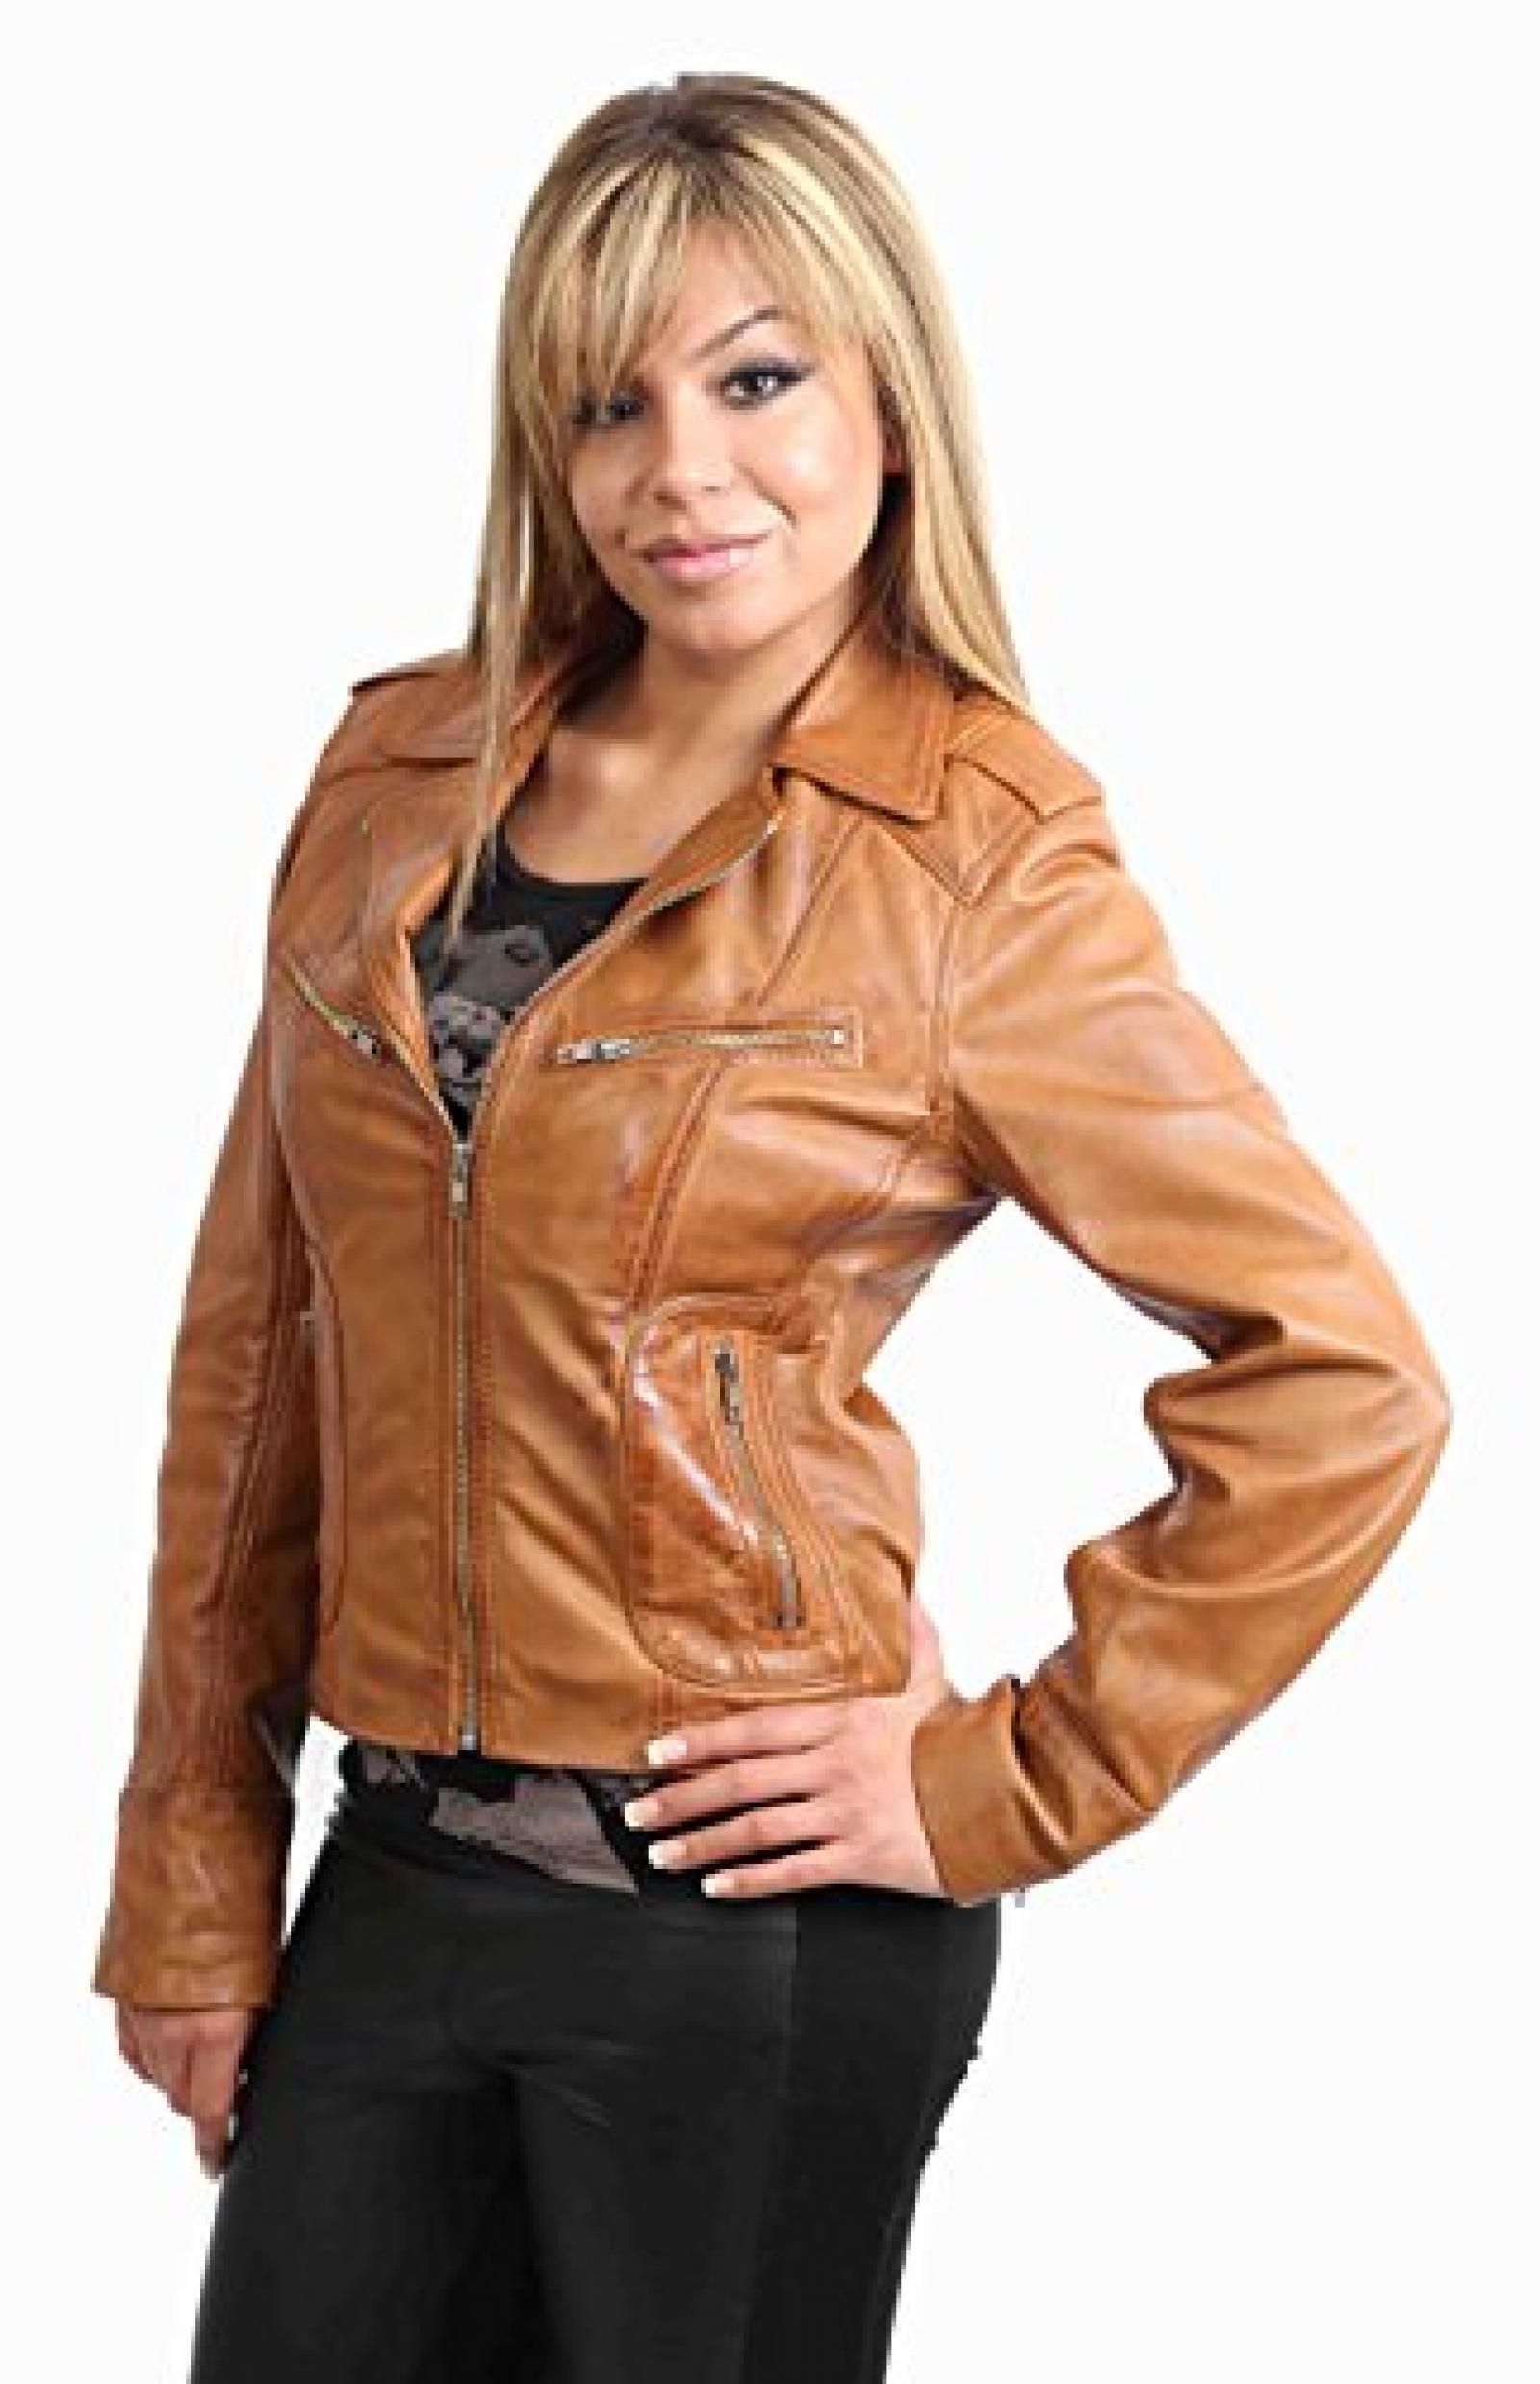 Damen Lederjacke neuen italienischen Motorradfahrer Jacke Stil 9823 Braune